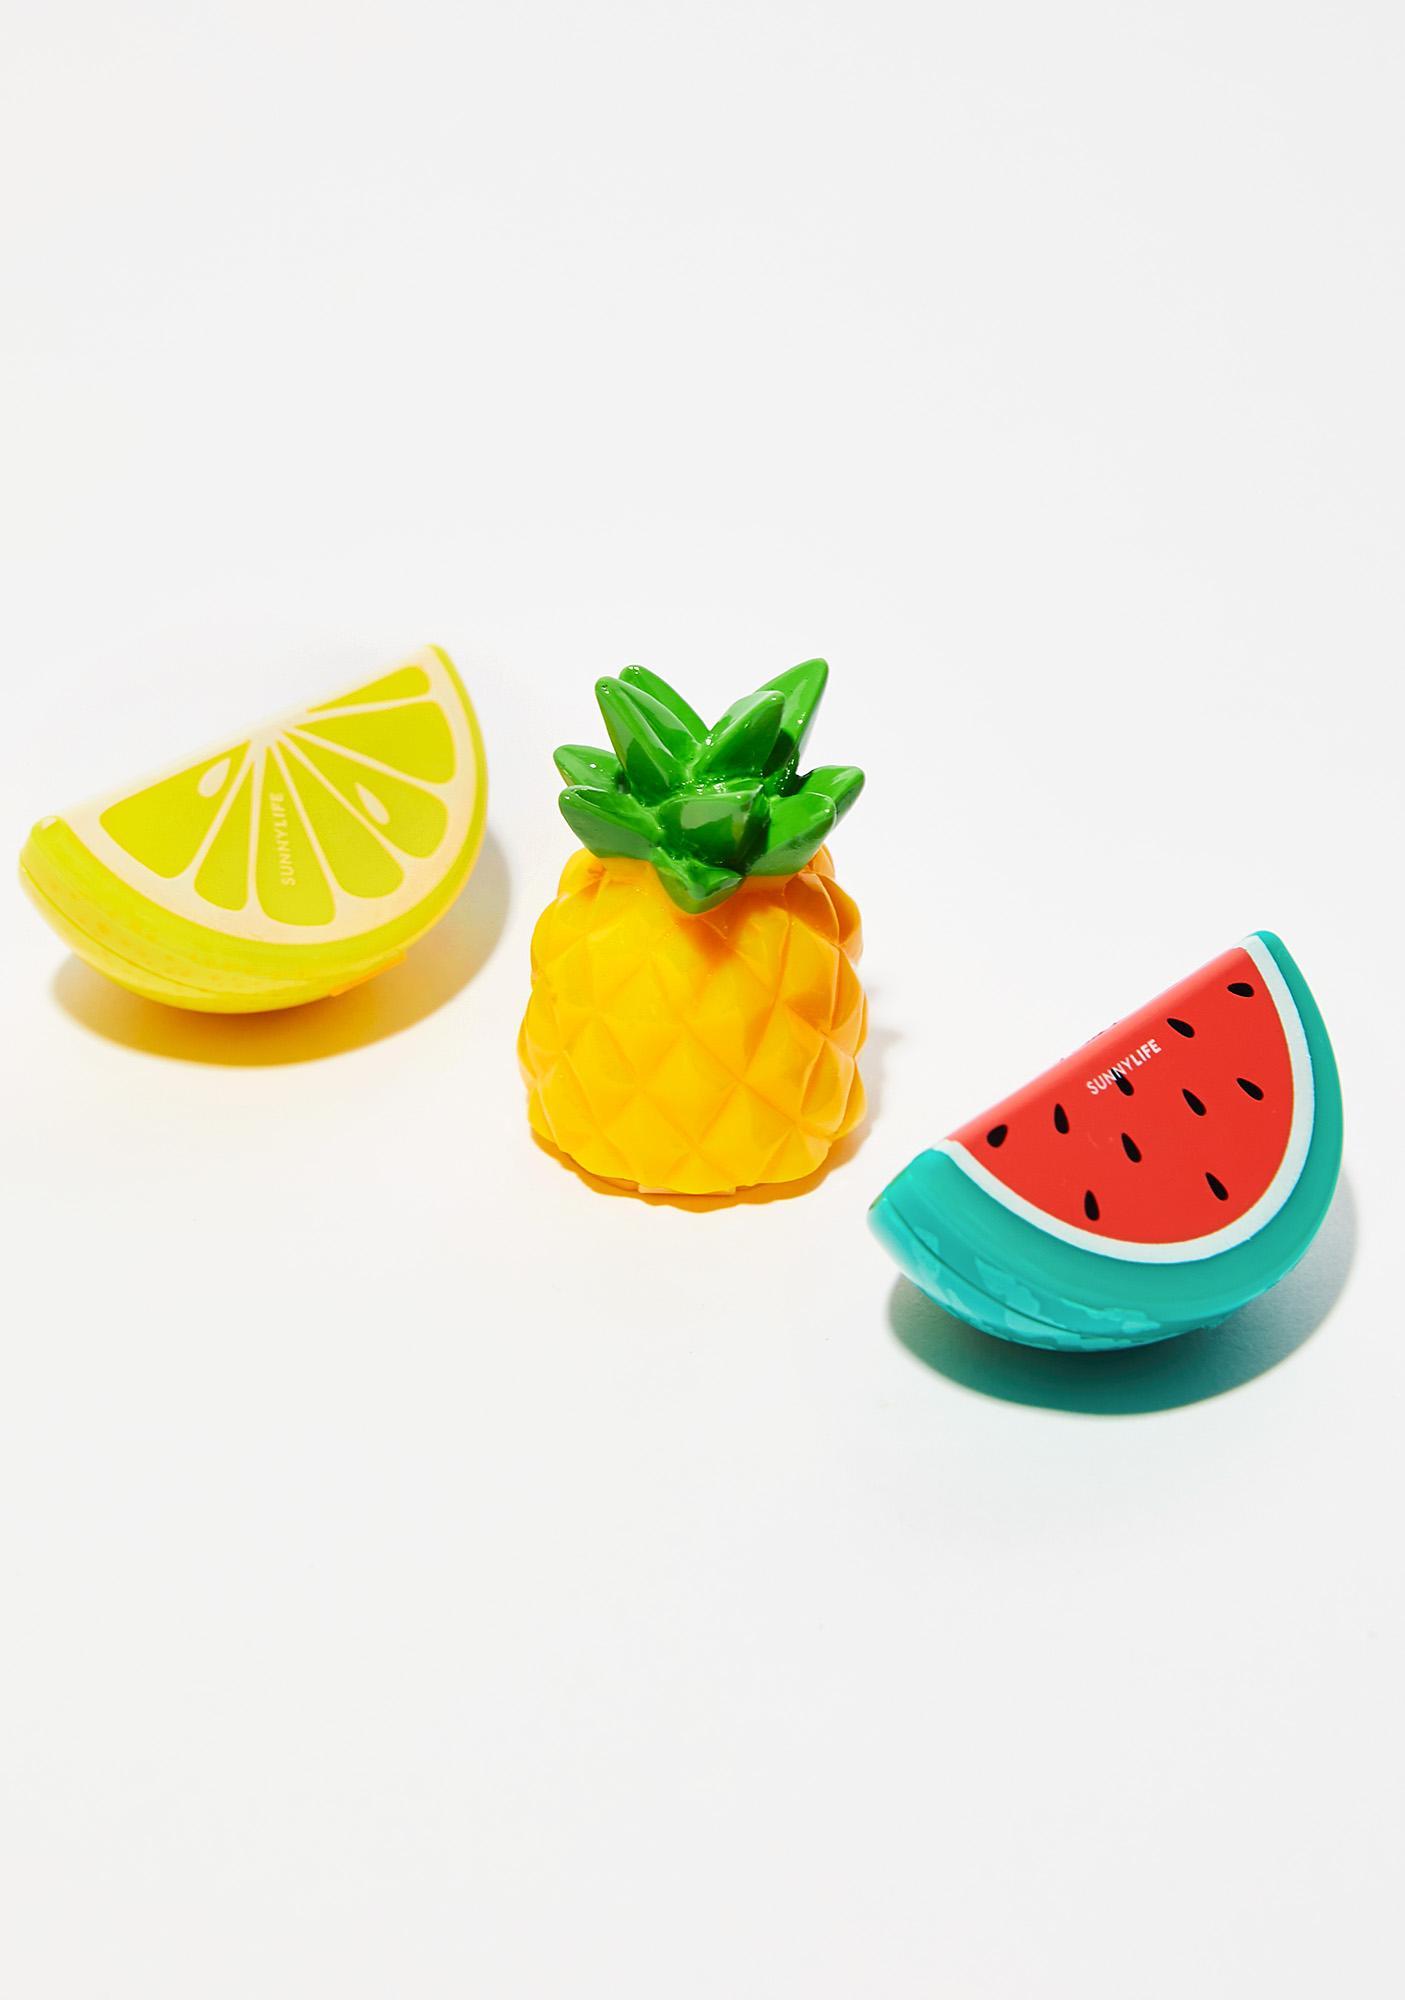 Tastin' Tropical Lip Balm Set